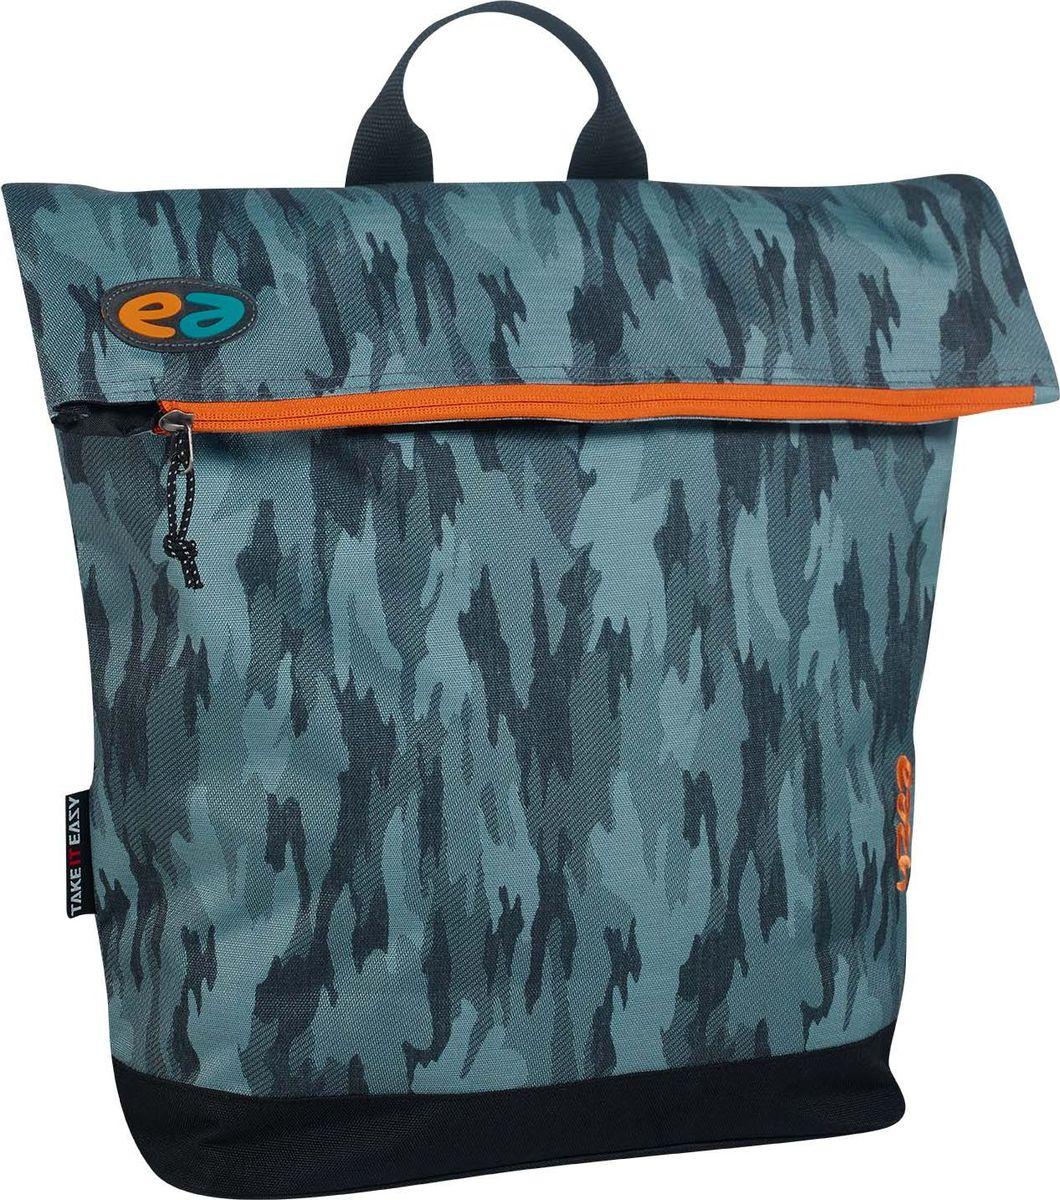 Thorka Рюкзак YZEA Courier Камо booq boa courier bcr10 gft сумка для ipad graphite